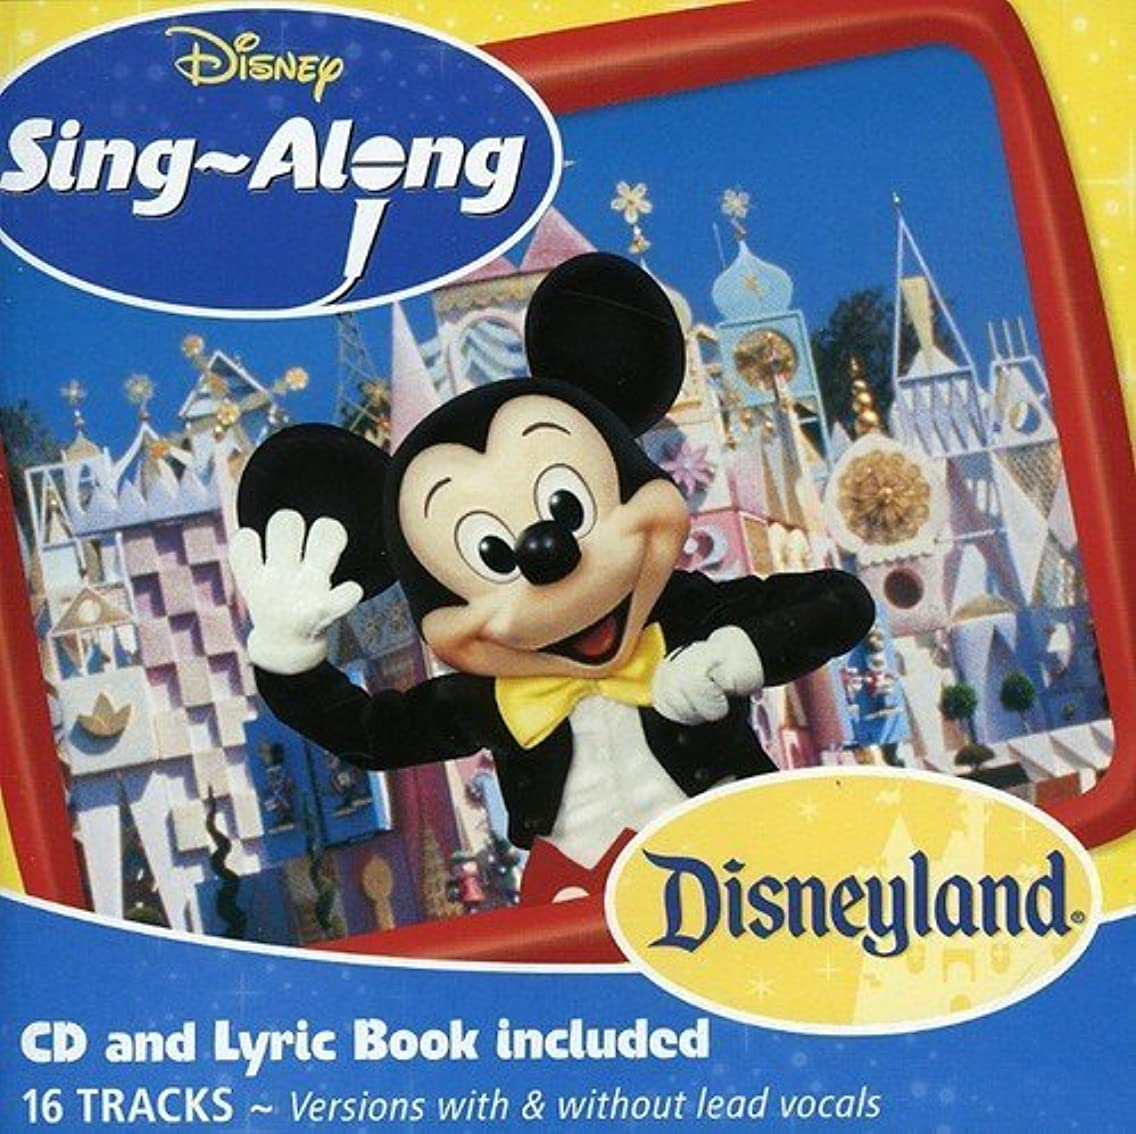 Disneyland Sing-A-Long by Disneyland Sing-A-Long